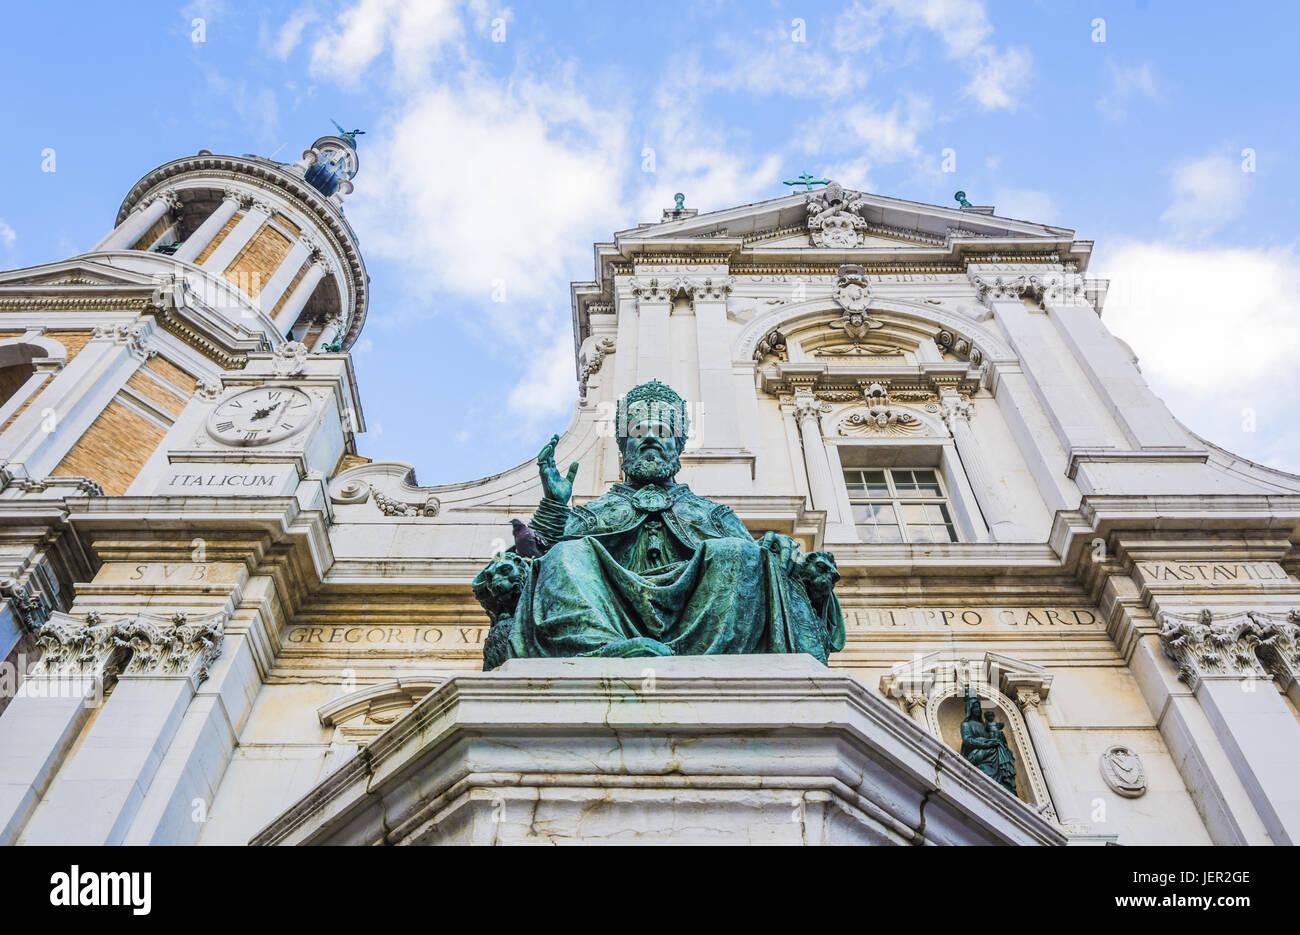 Sixtus V bronze statue in Loreto, Italy - Stock Image